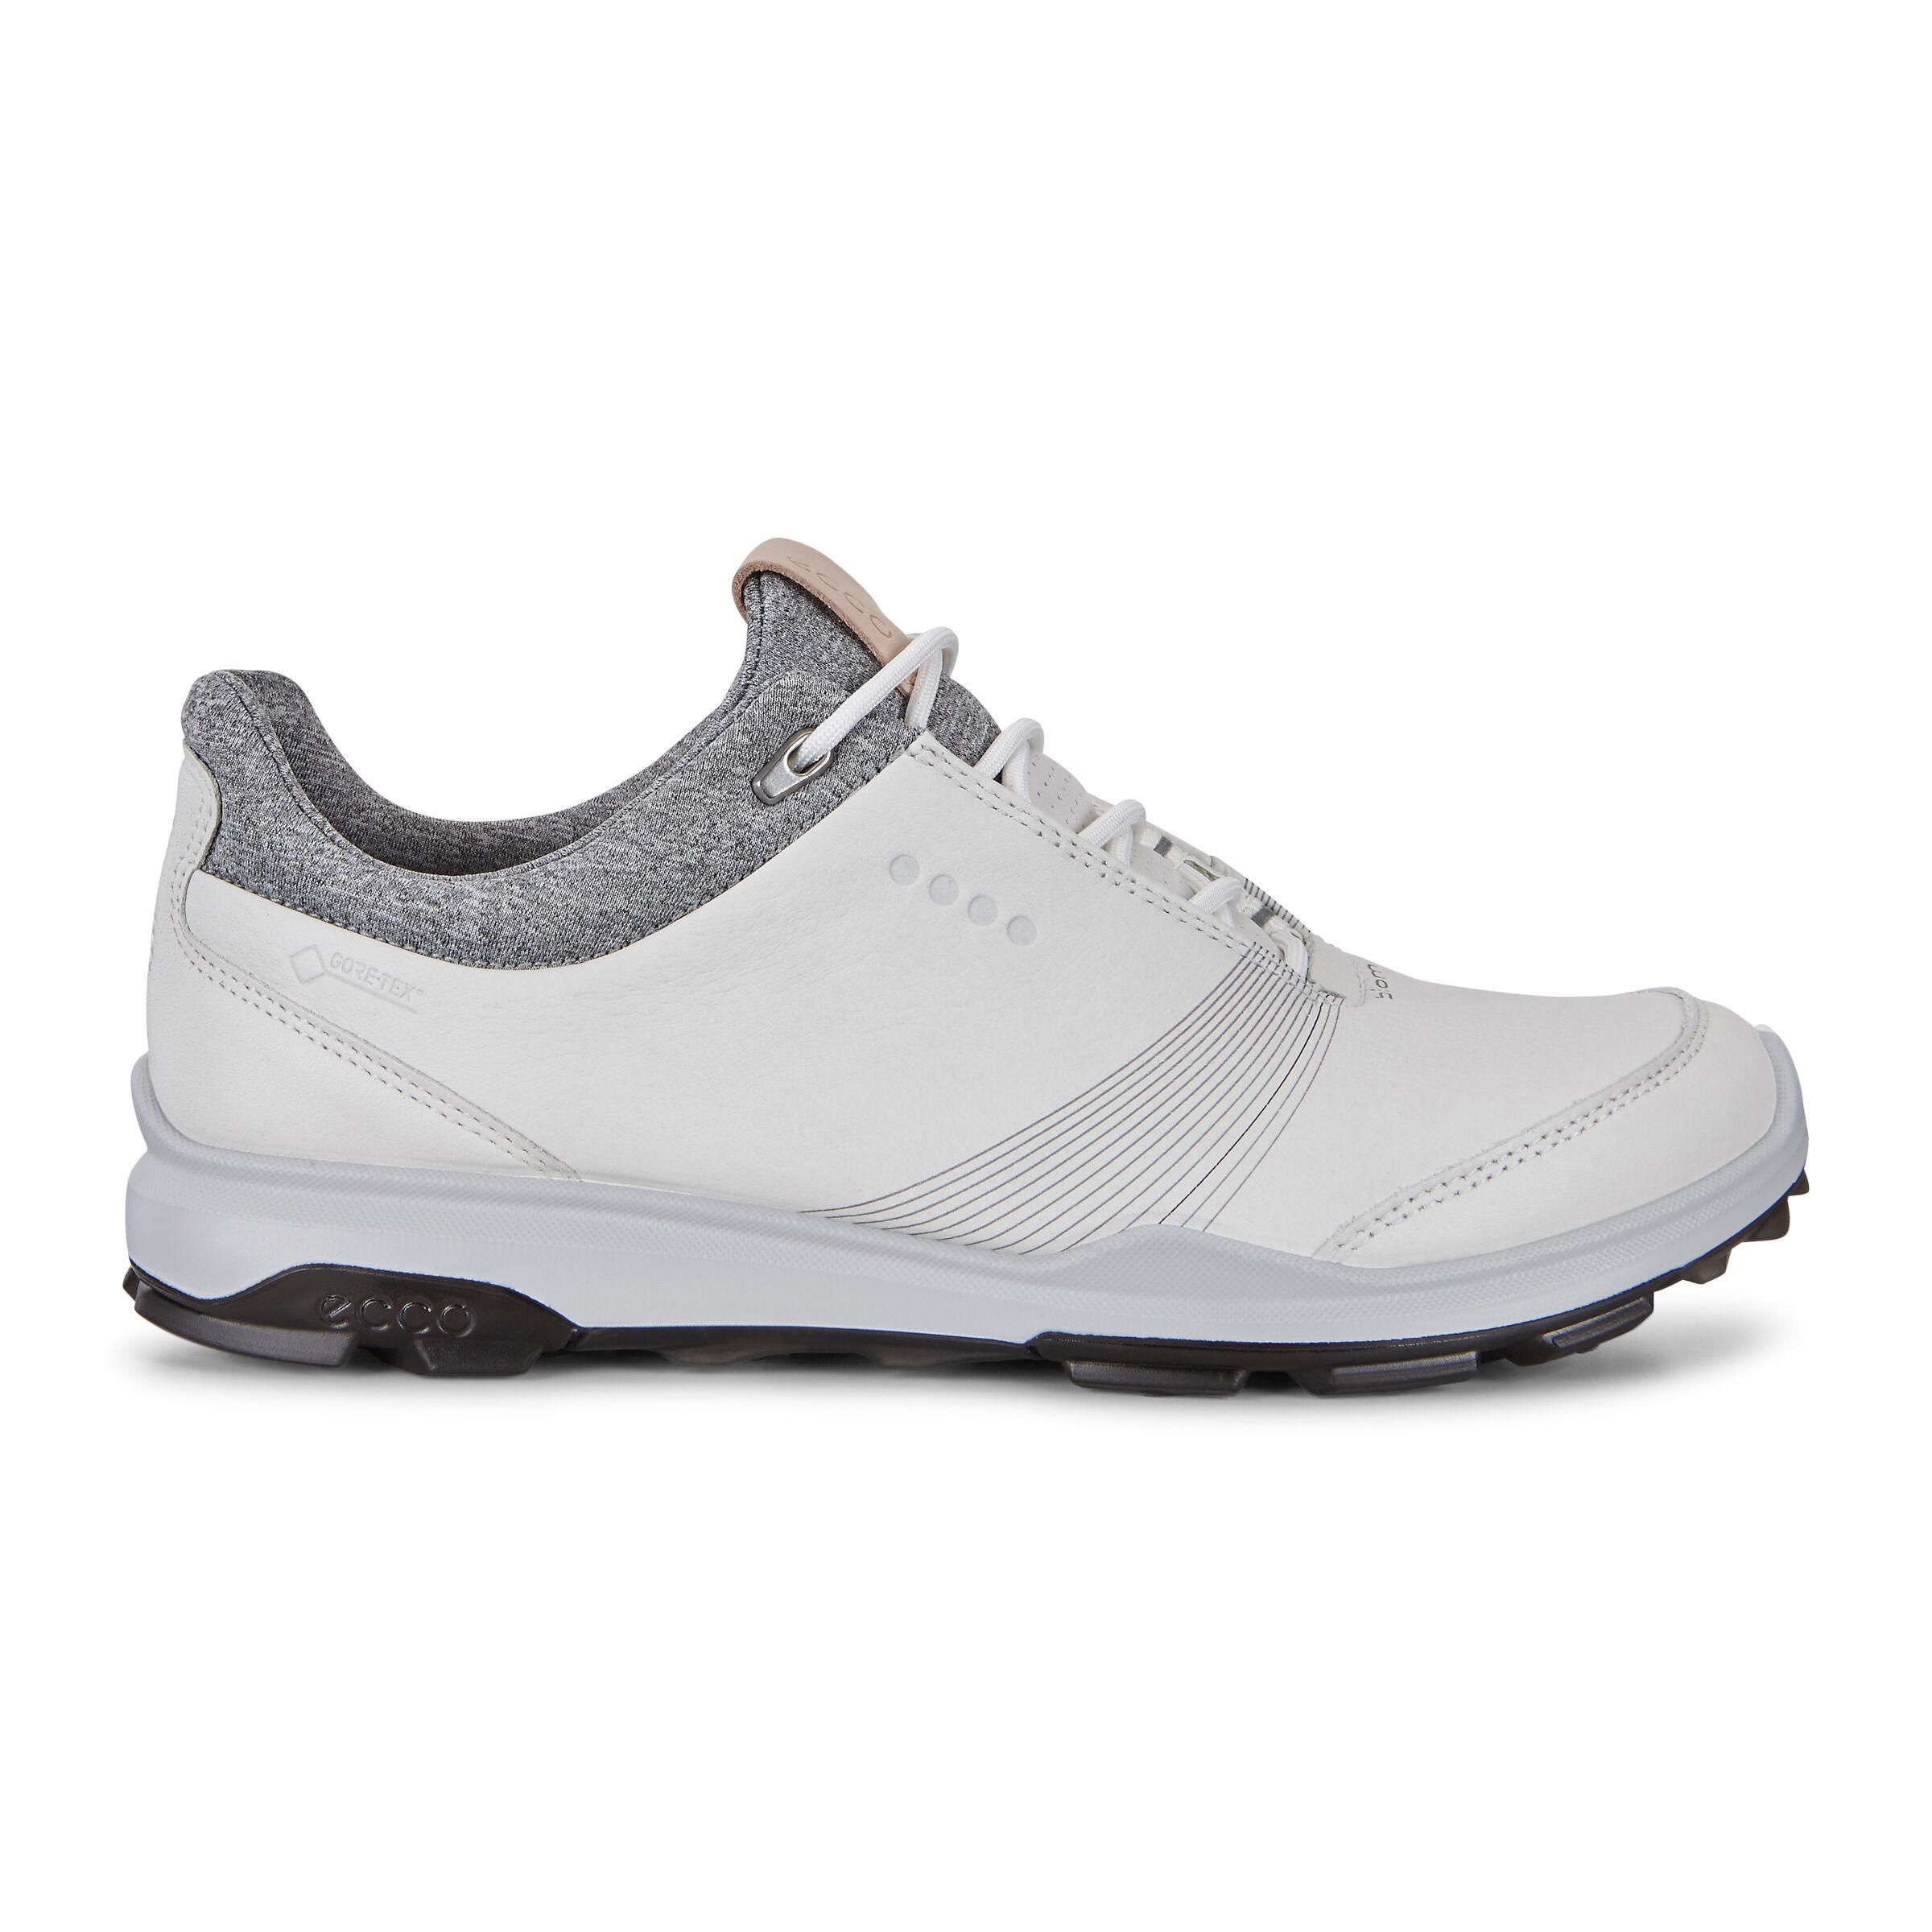 Women's Shoes | ECCO® Shoes